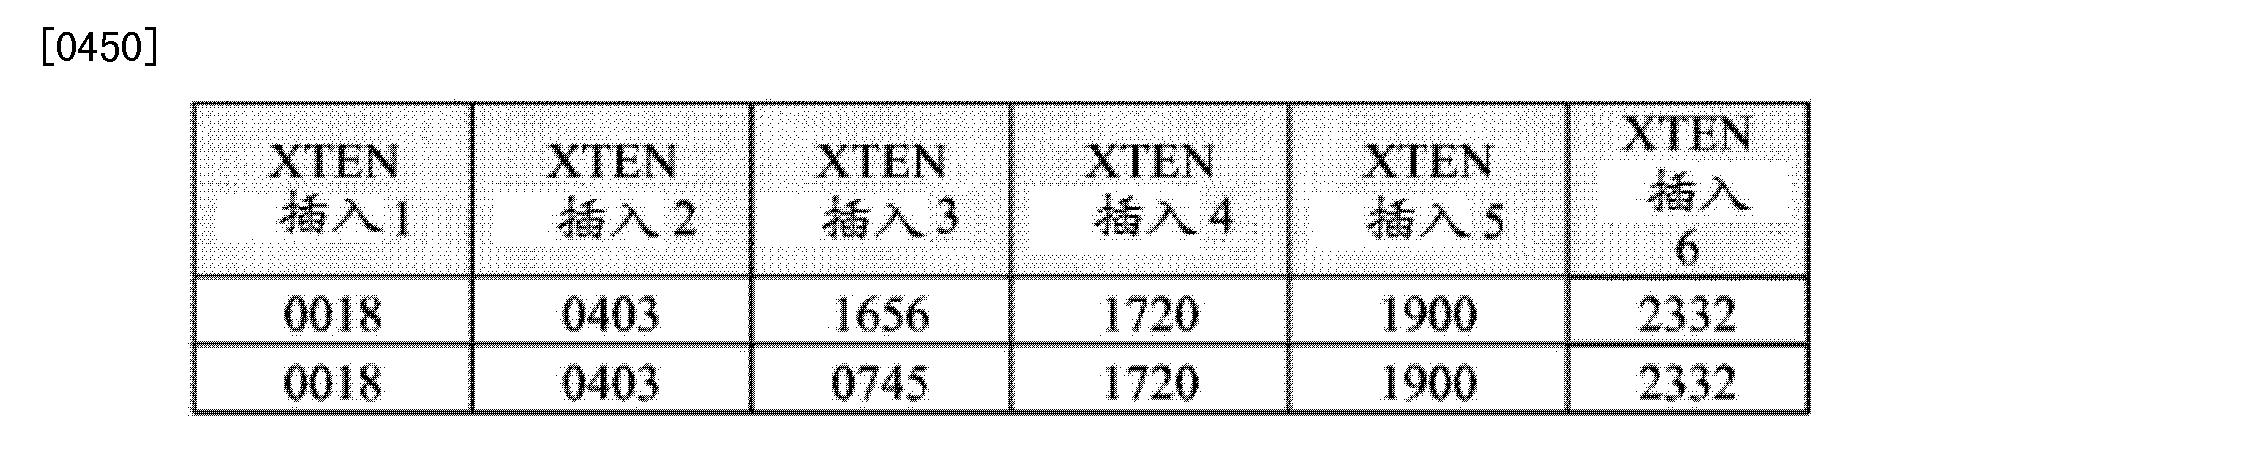 Figure CN104661674AD00992